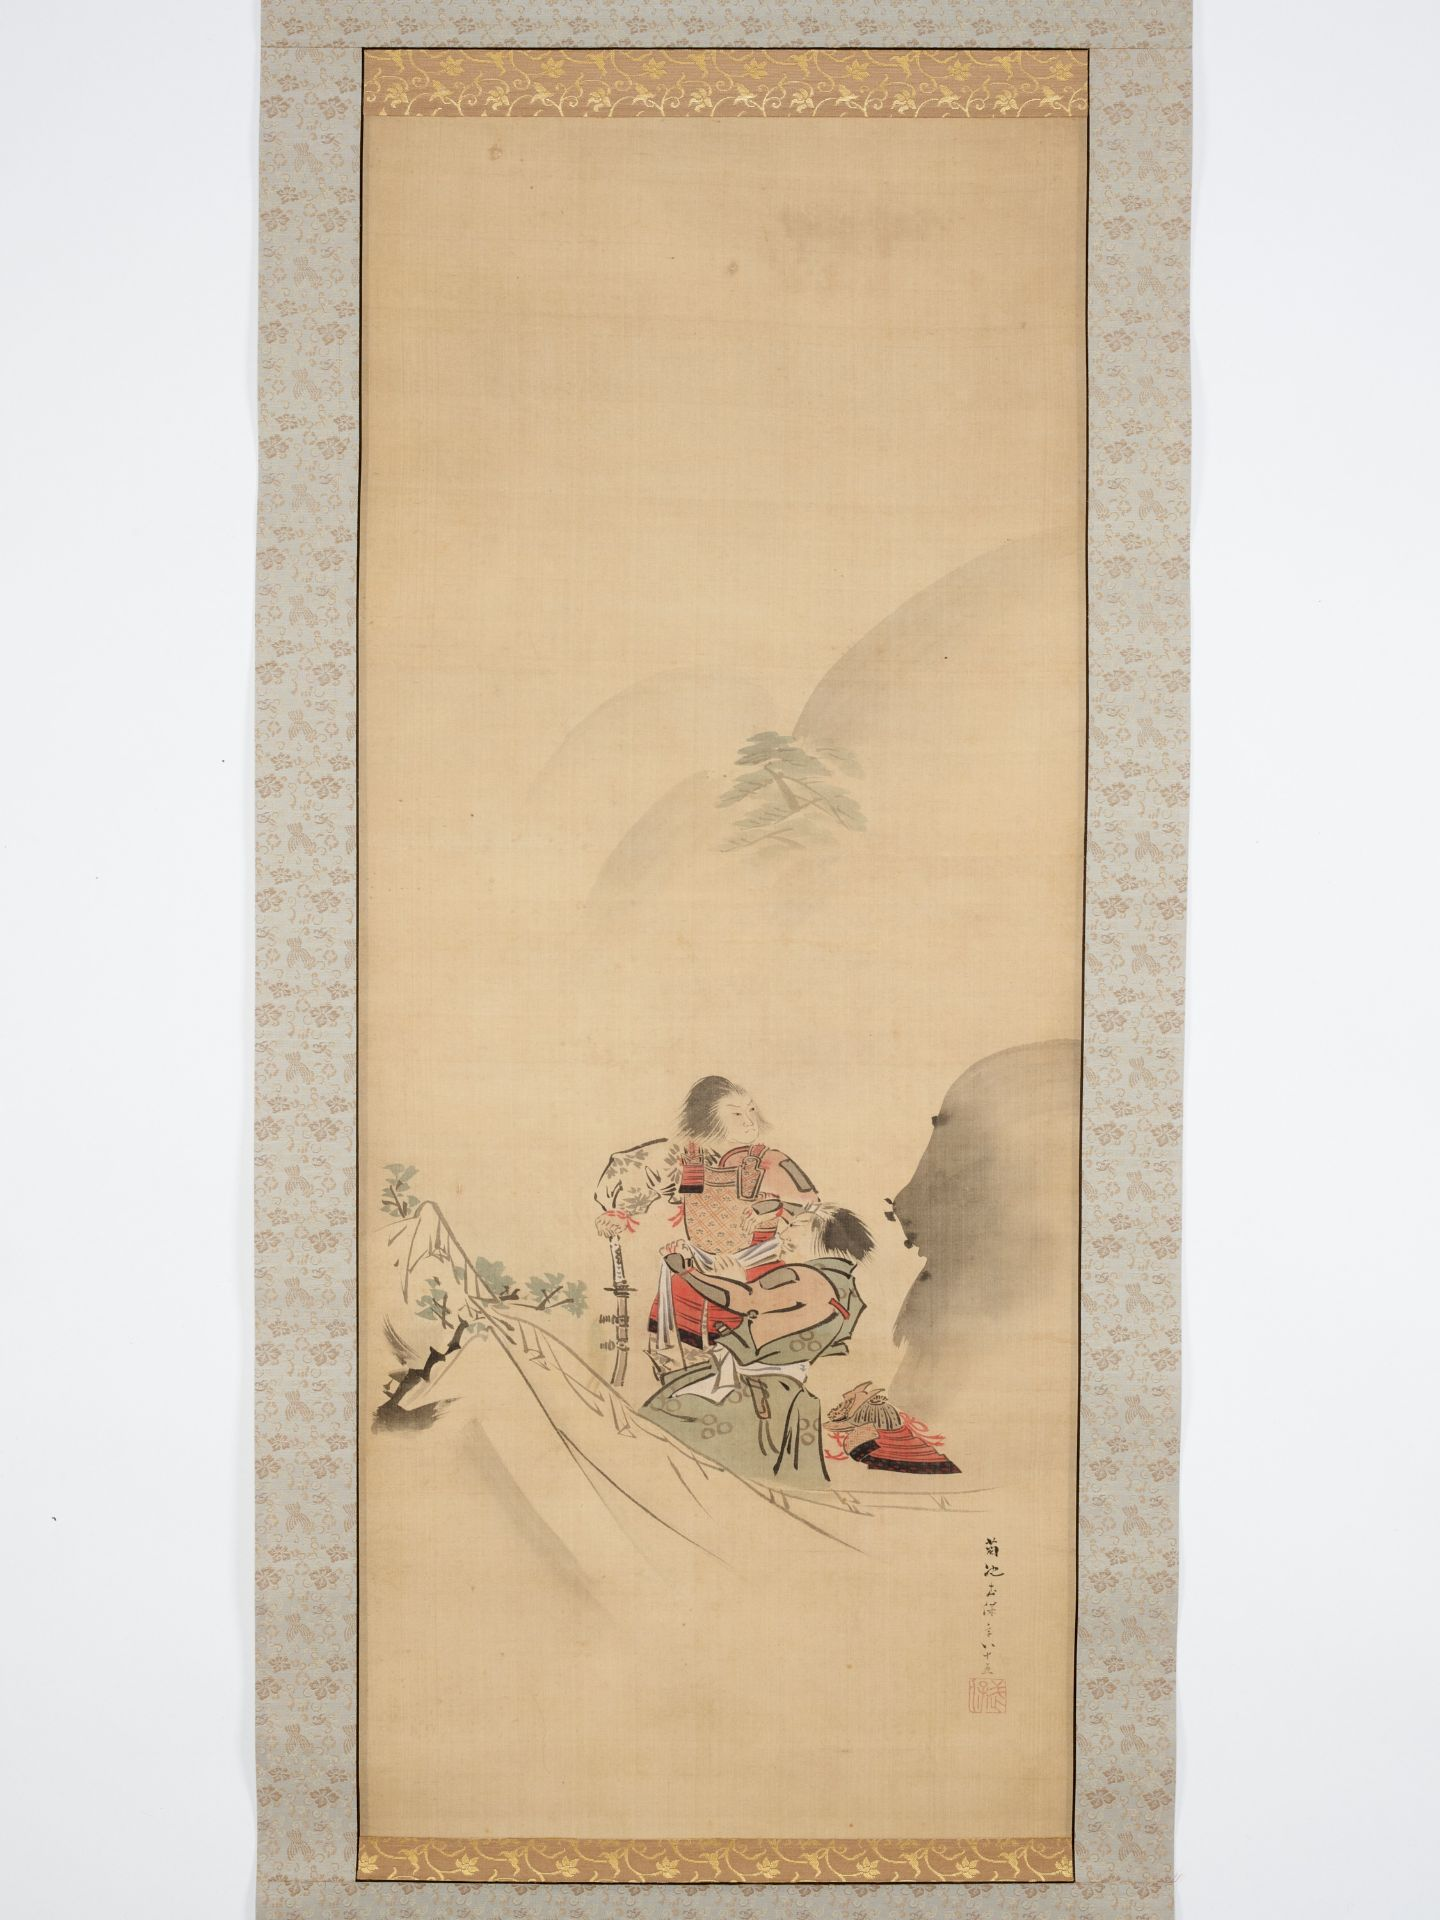 KIKUCHI YOSAI: A SCROLL PAINTING OF TWO SAMURAI IN THE MOUNTAINS